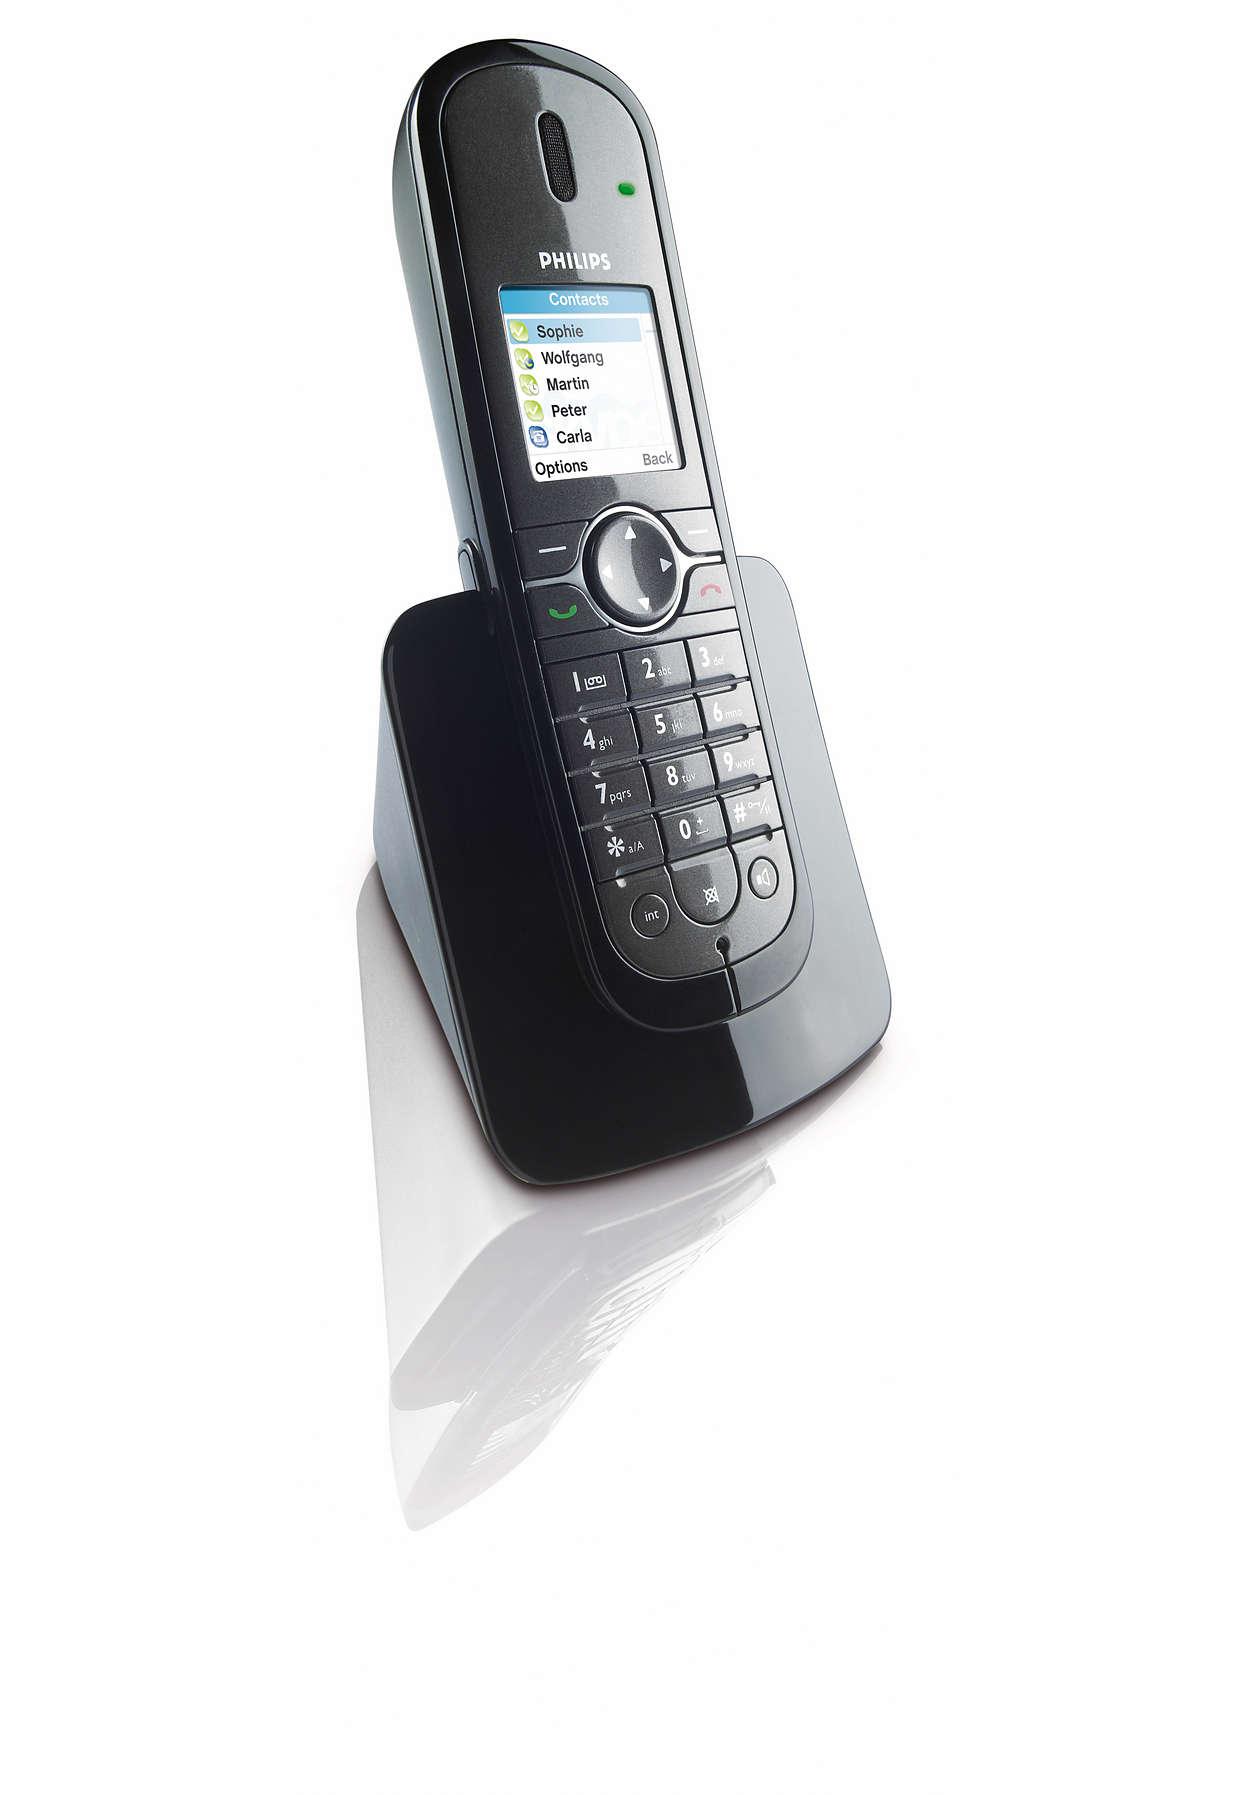 Einfache Skype™- und Festnetzanrufe